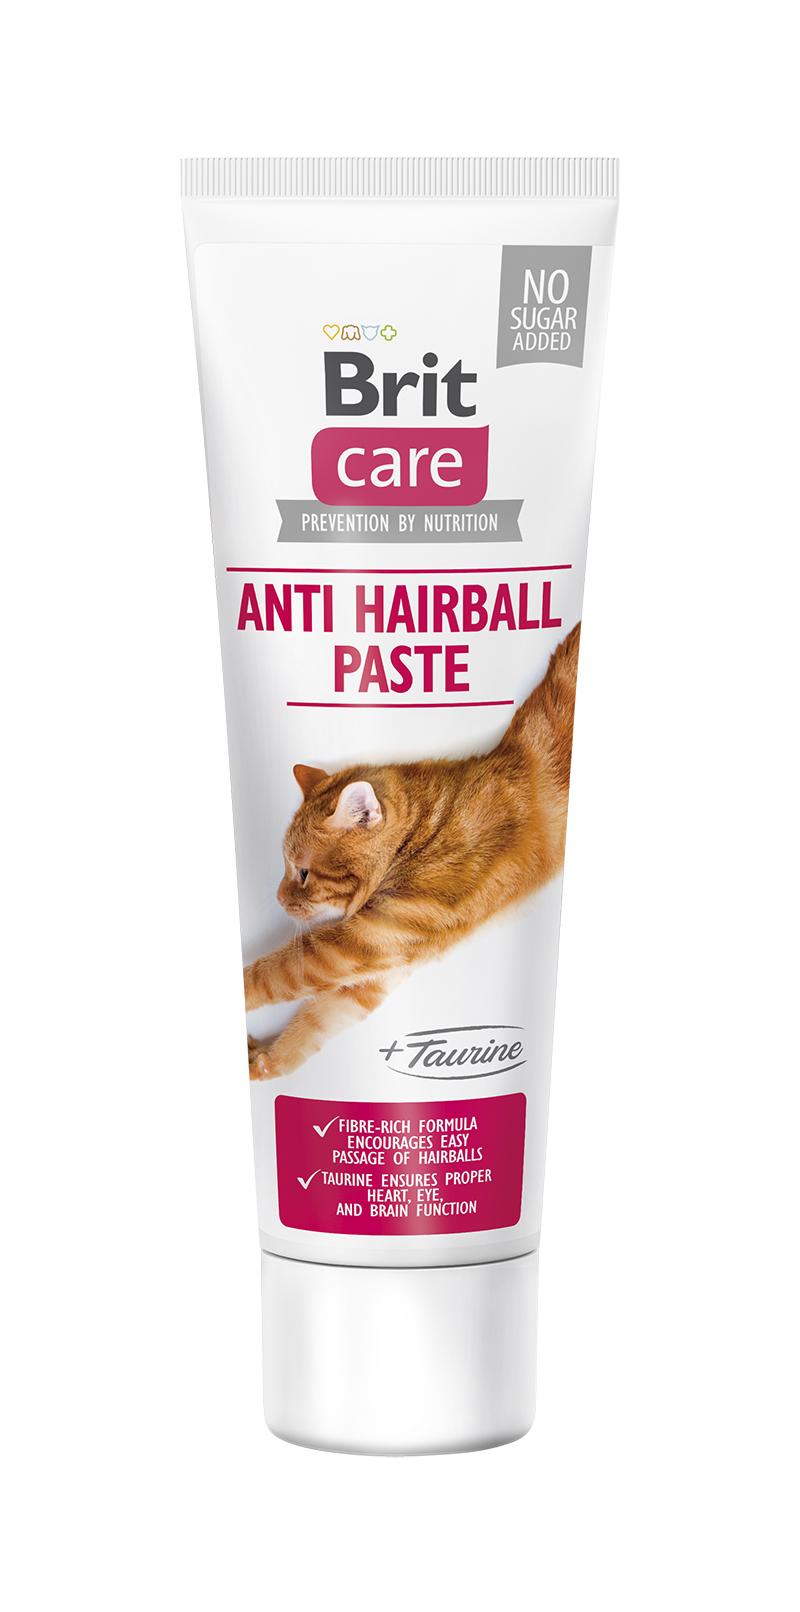 Brit Cat Paste Antihairball Med Taurin